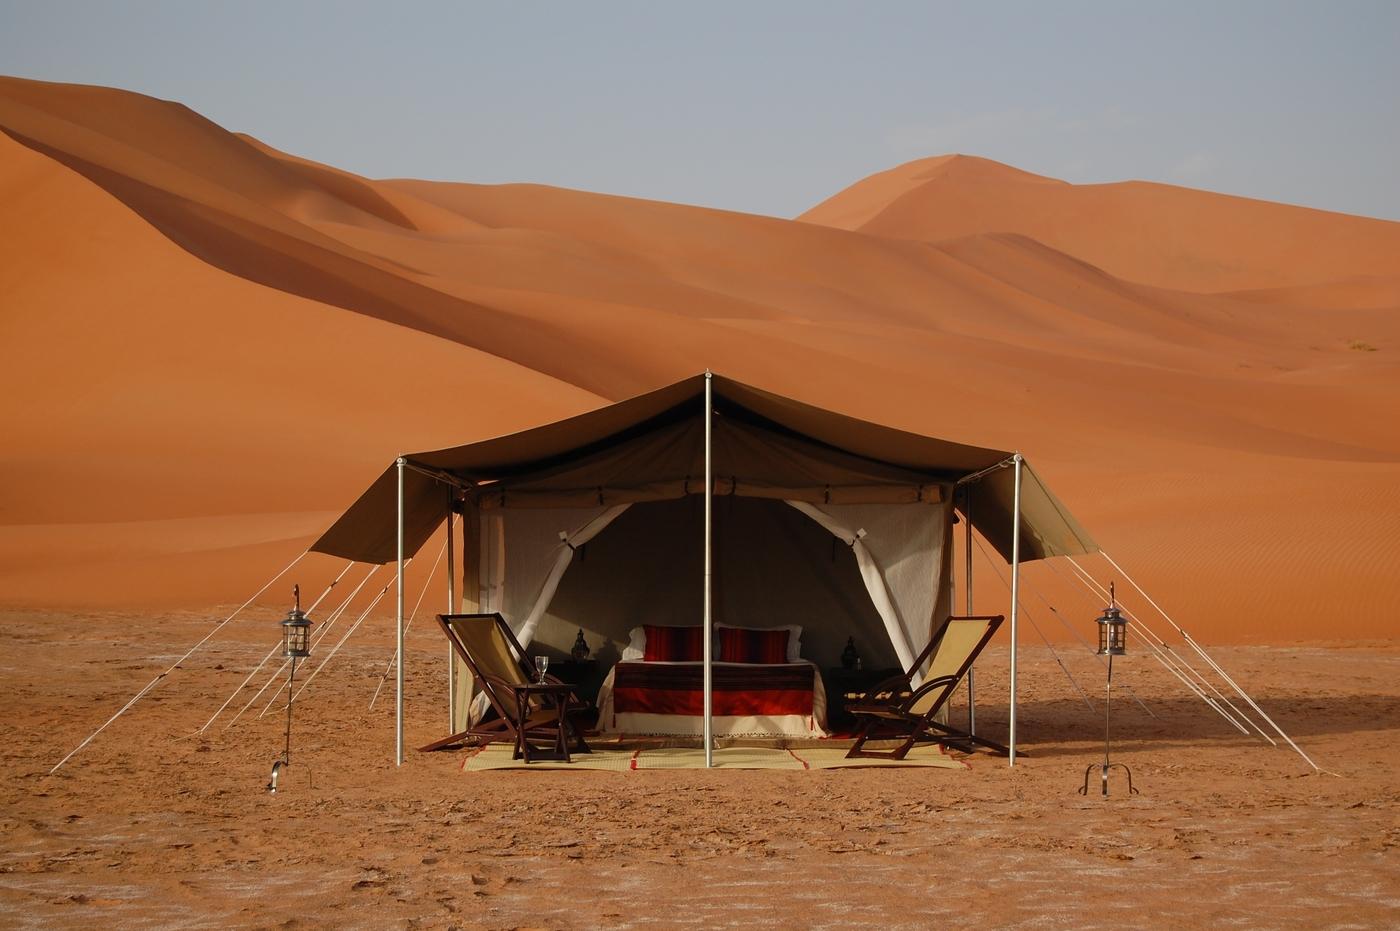 Hud Hud camp Oman